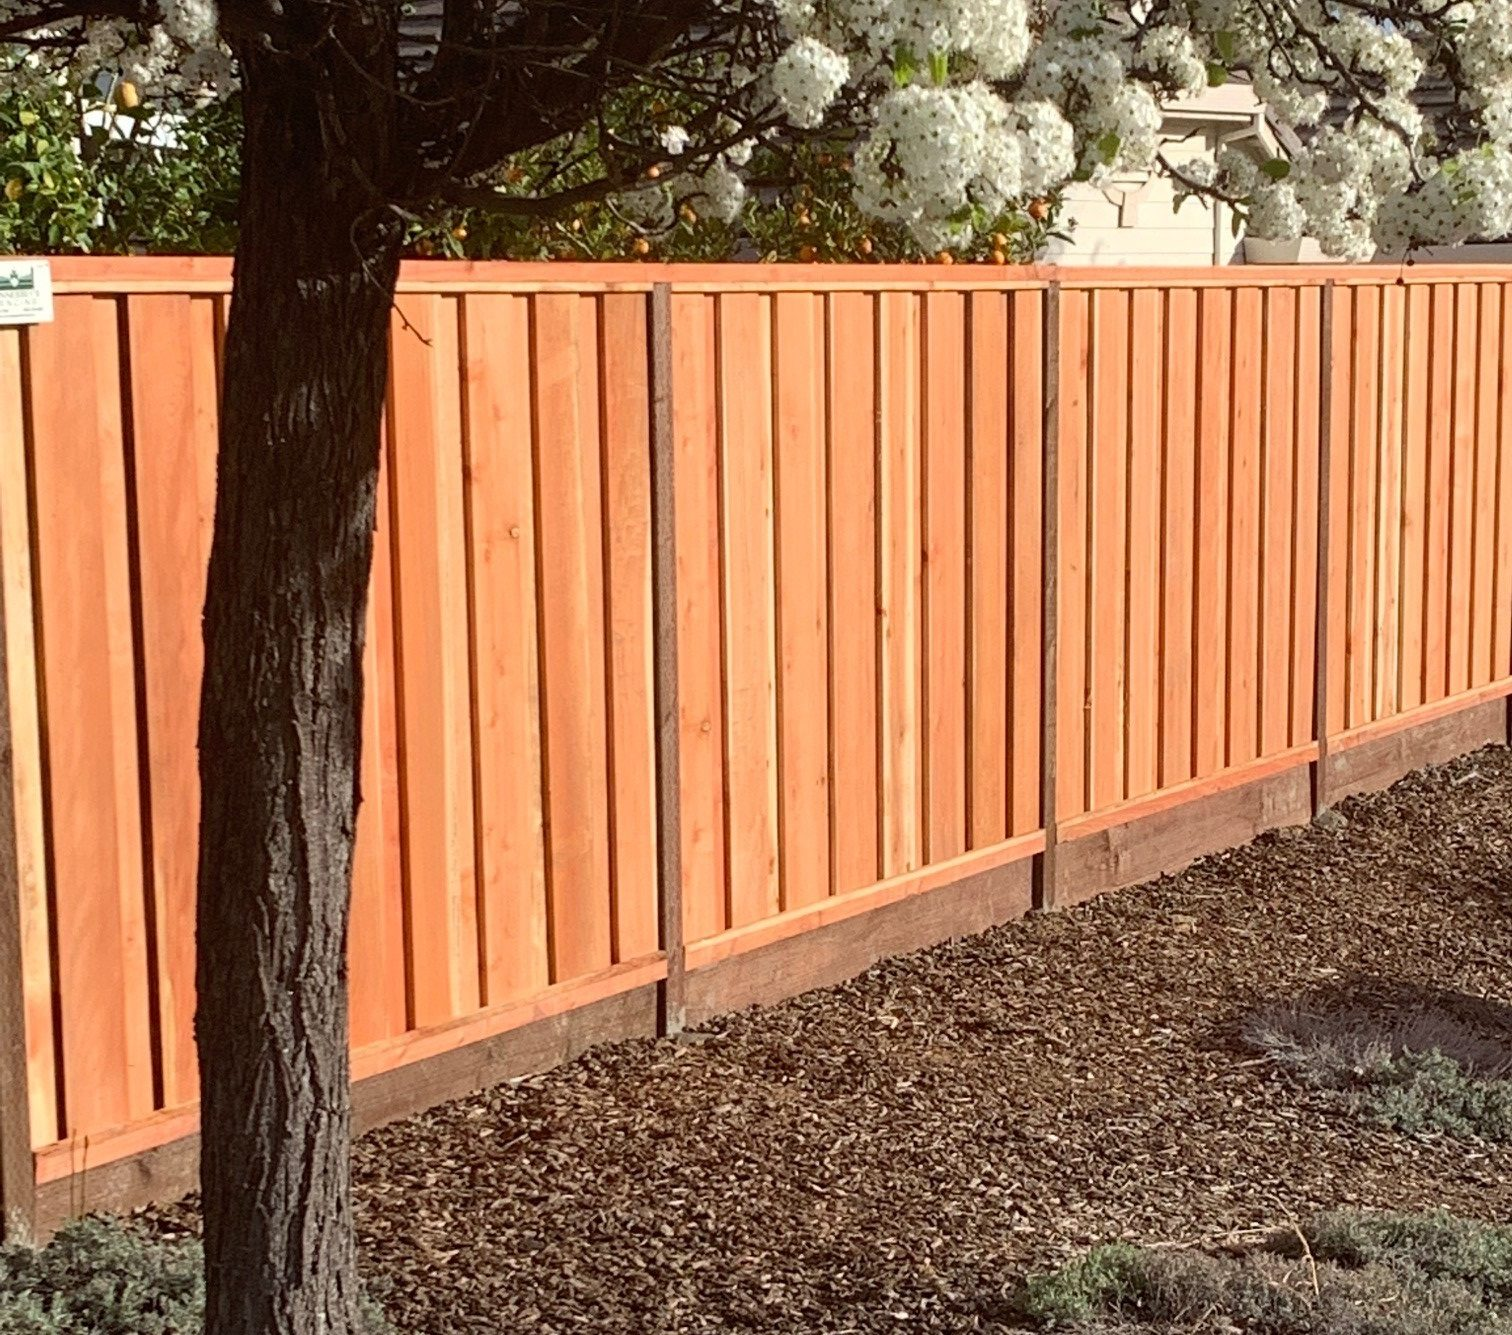 Good Neighbor Redwood Board on Board Fence Fremont, CA